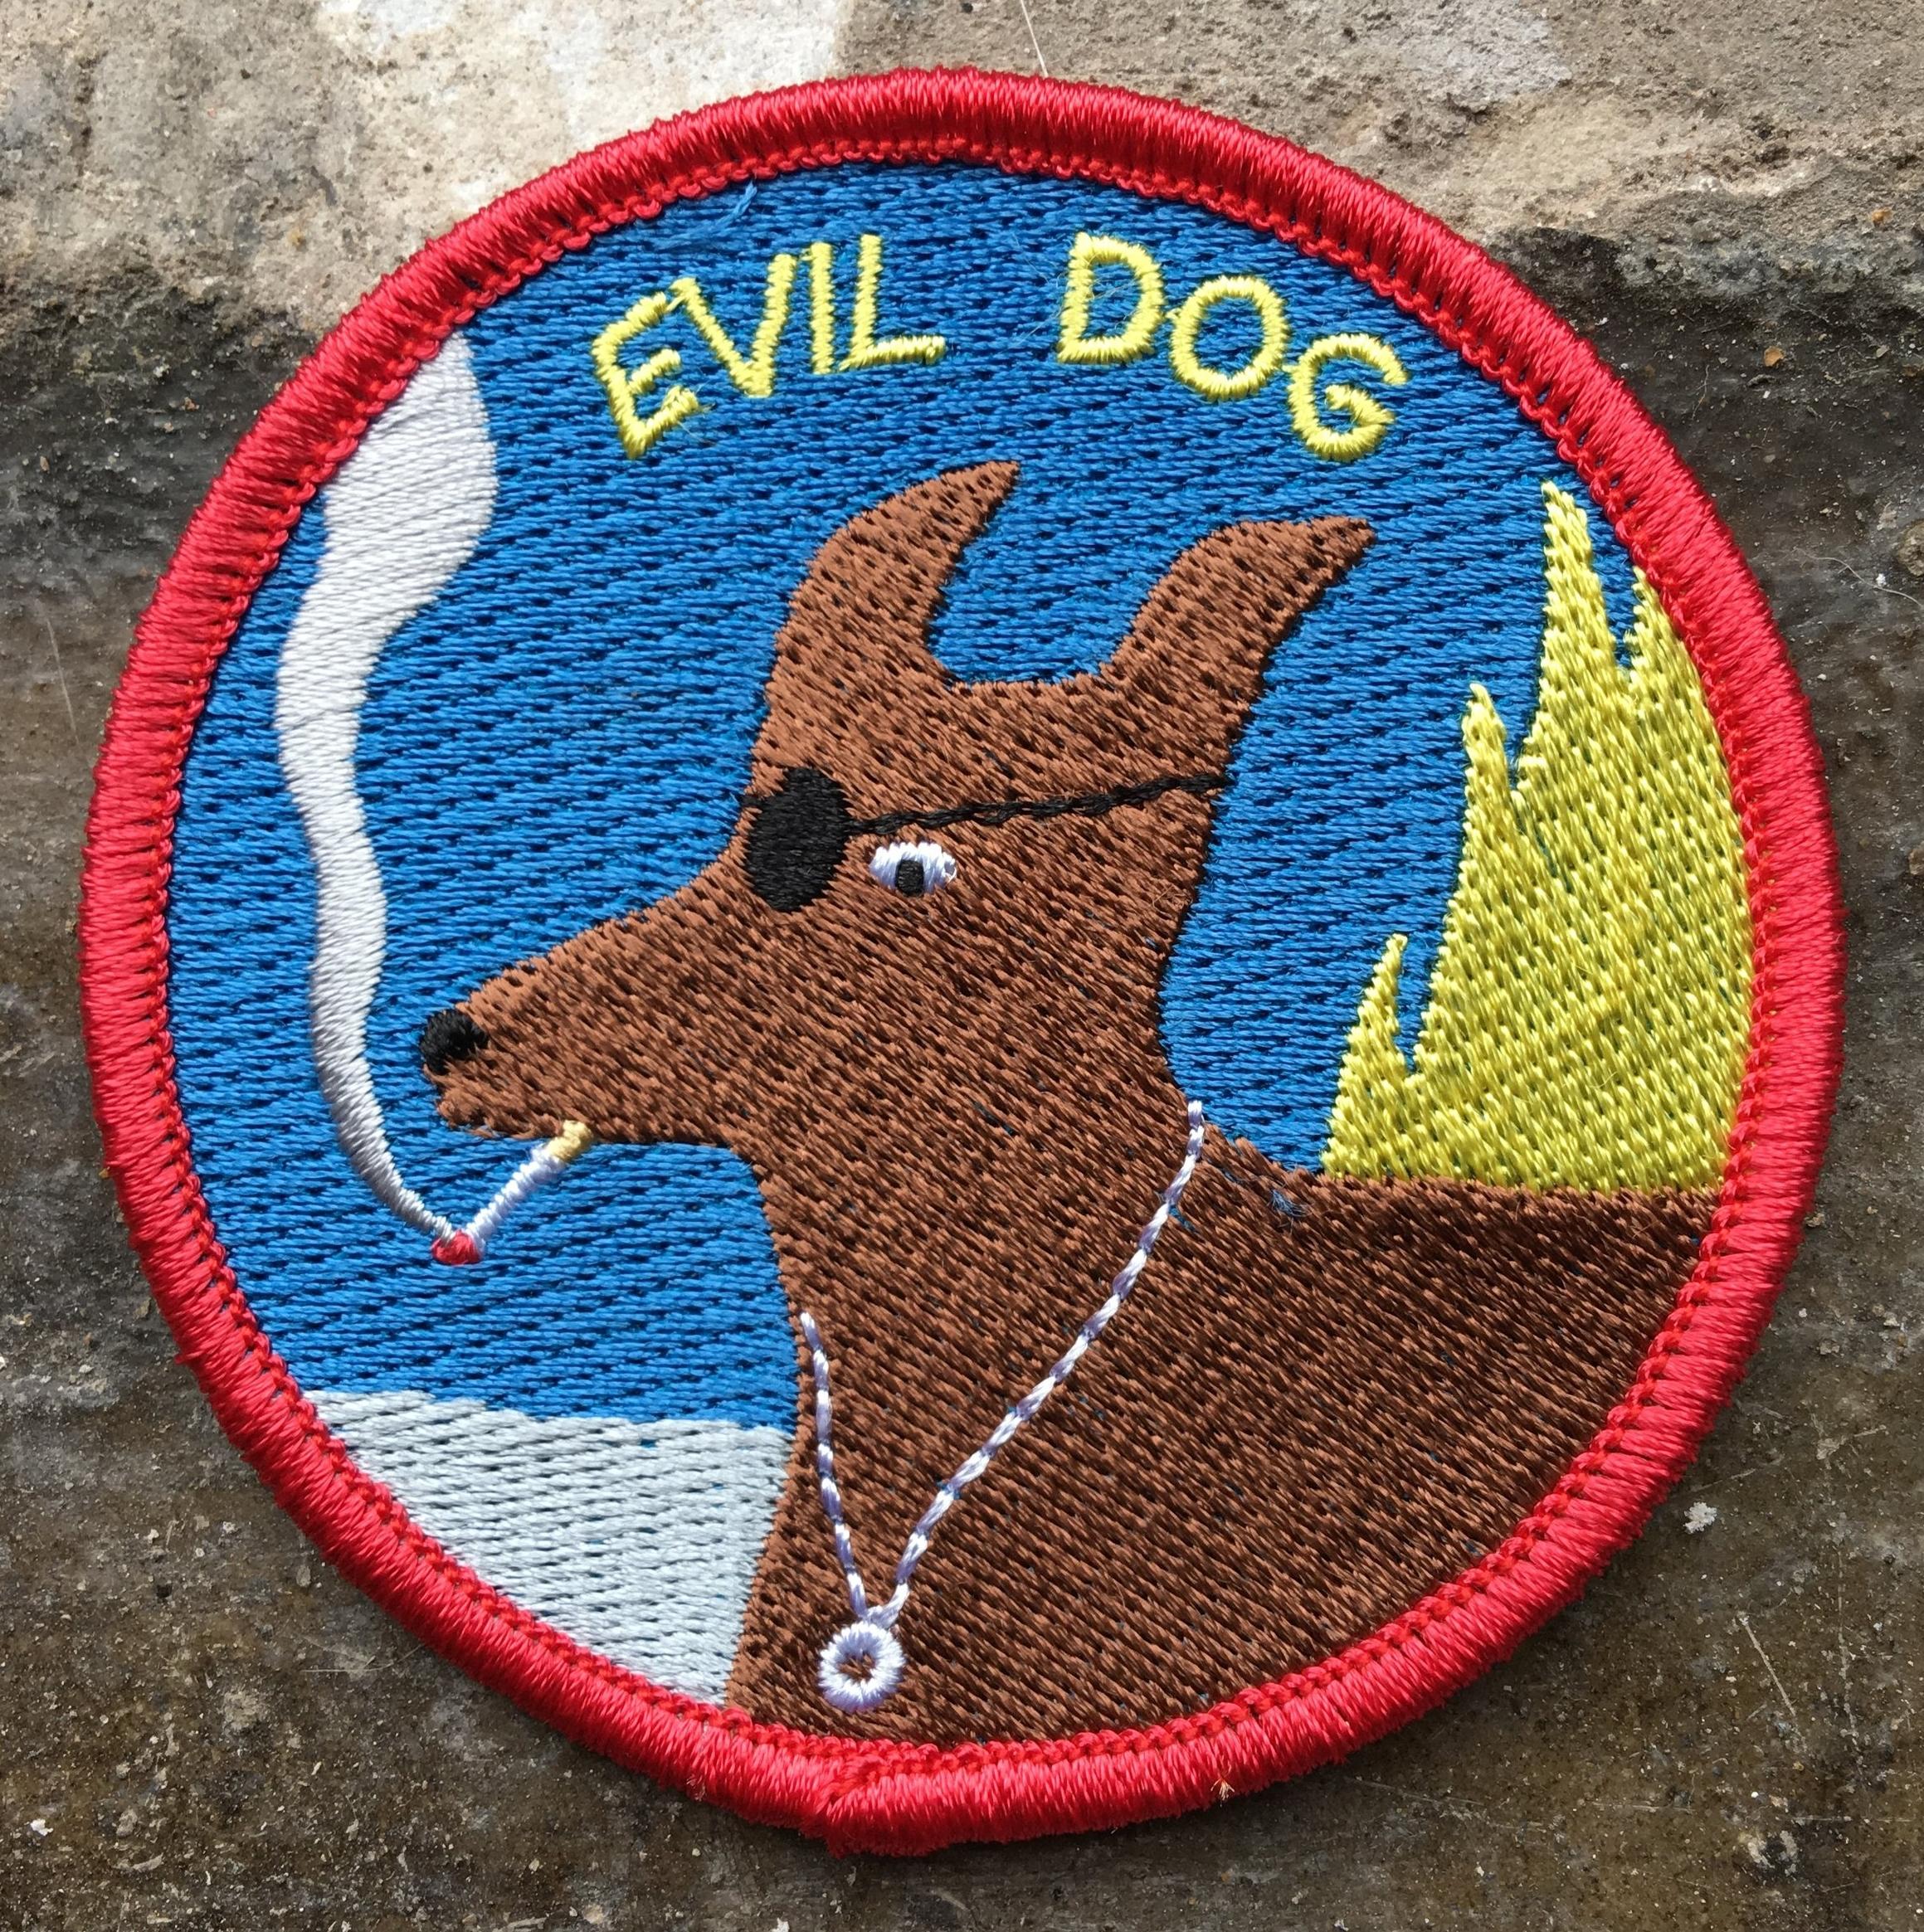 Evil Dog (2013)